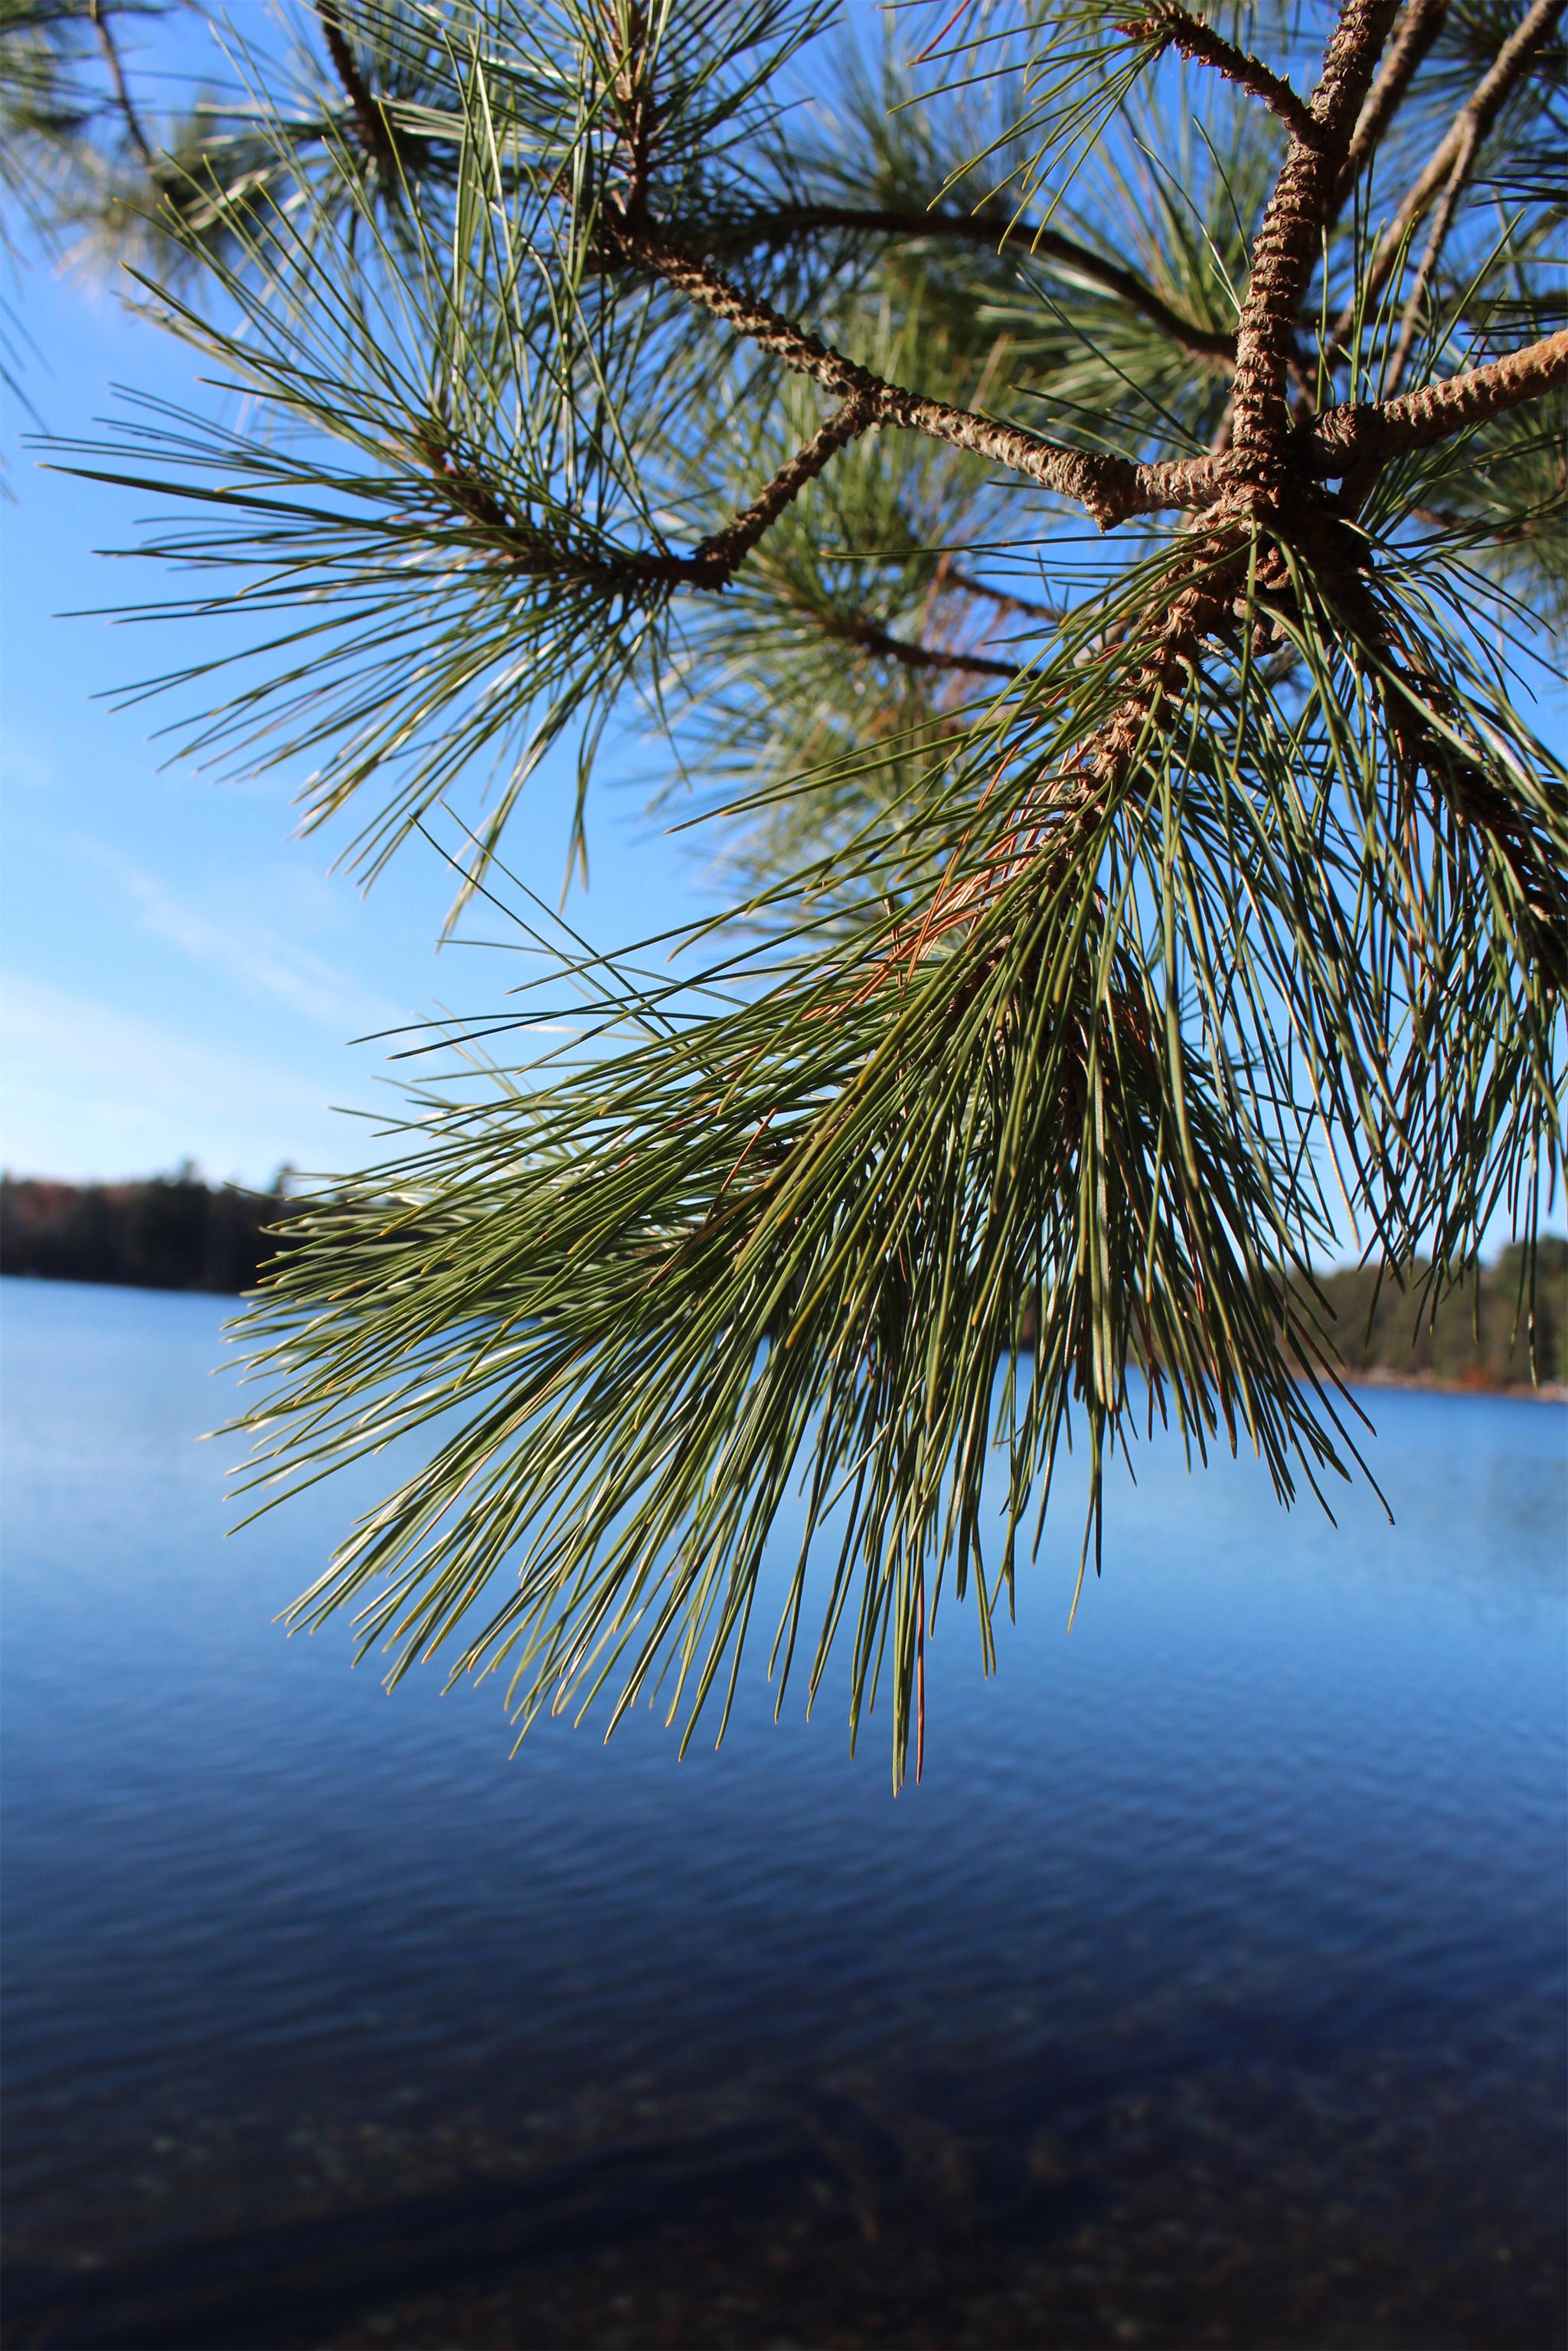 A view through the pine trees of South Blue Lake, Hazelhurst. Kim Johnson photo